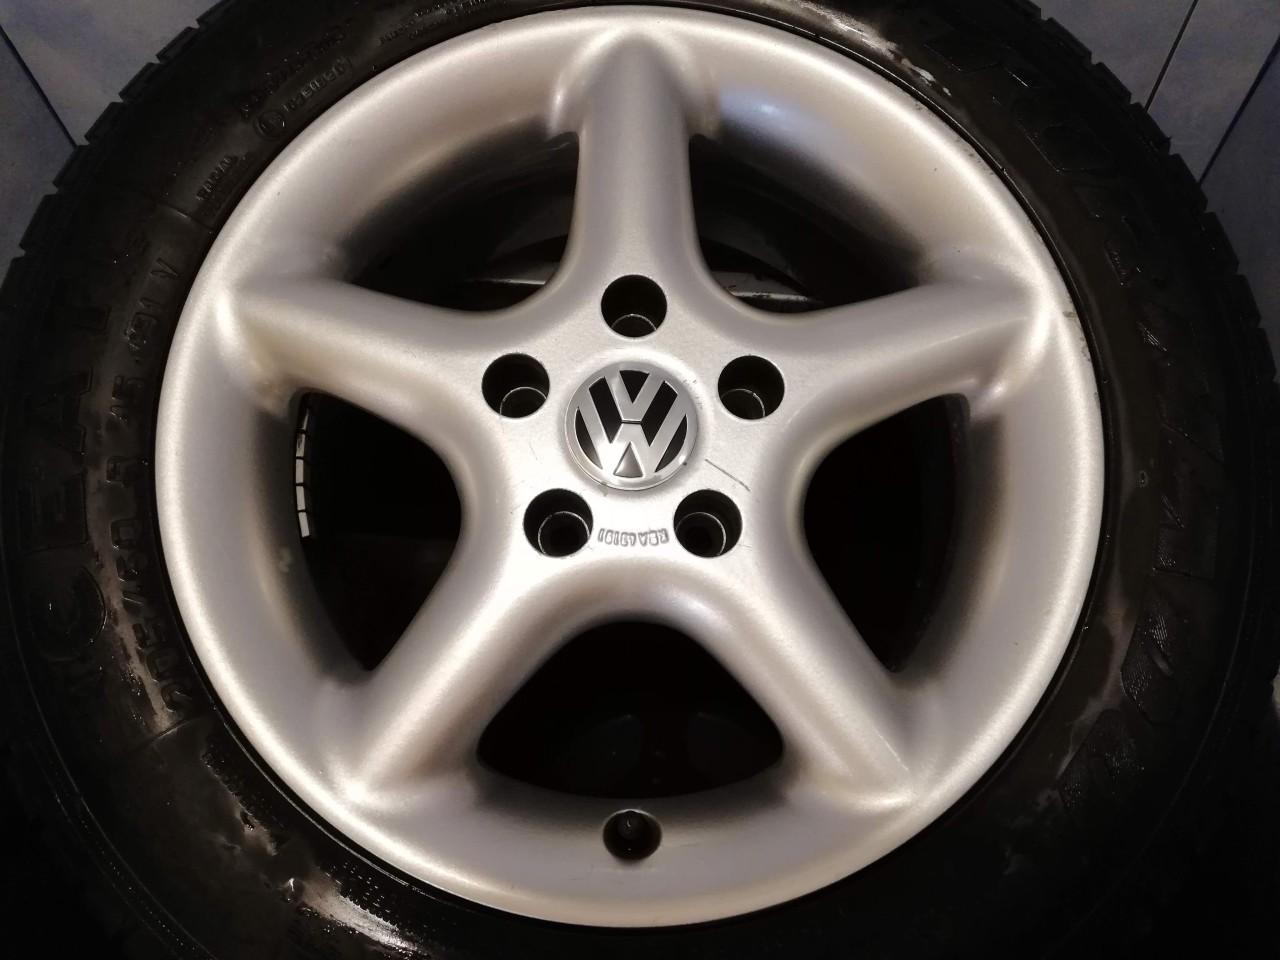 Jante aliaj 15 VW Volkswagen Golf 5 6 7, Passat, Caddy, Touran, Sharan, Jetta – 5x112